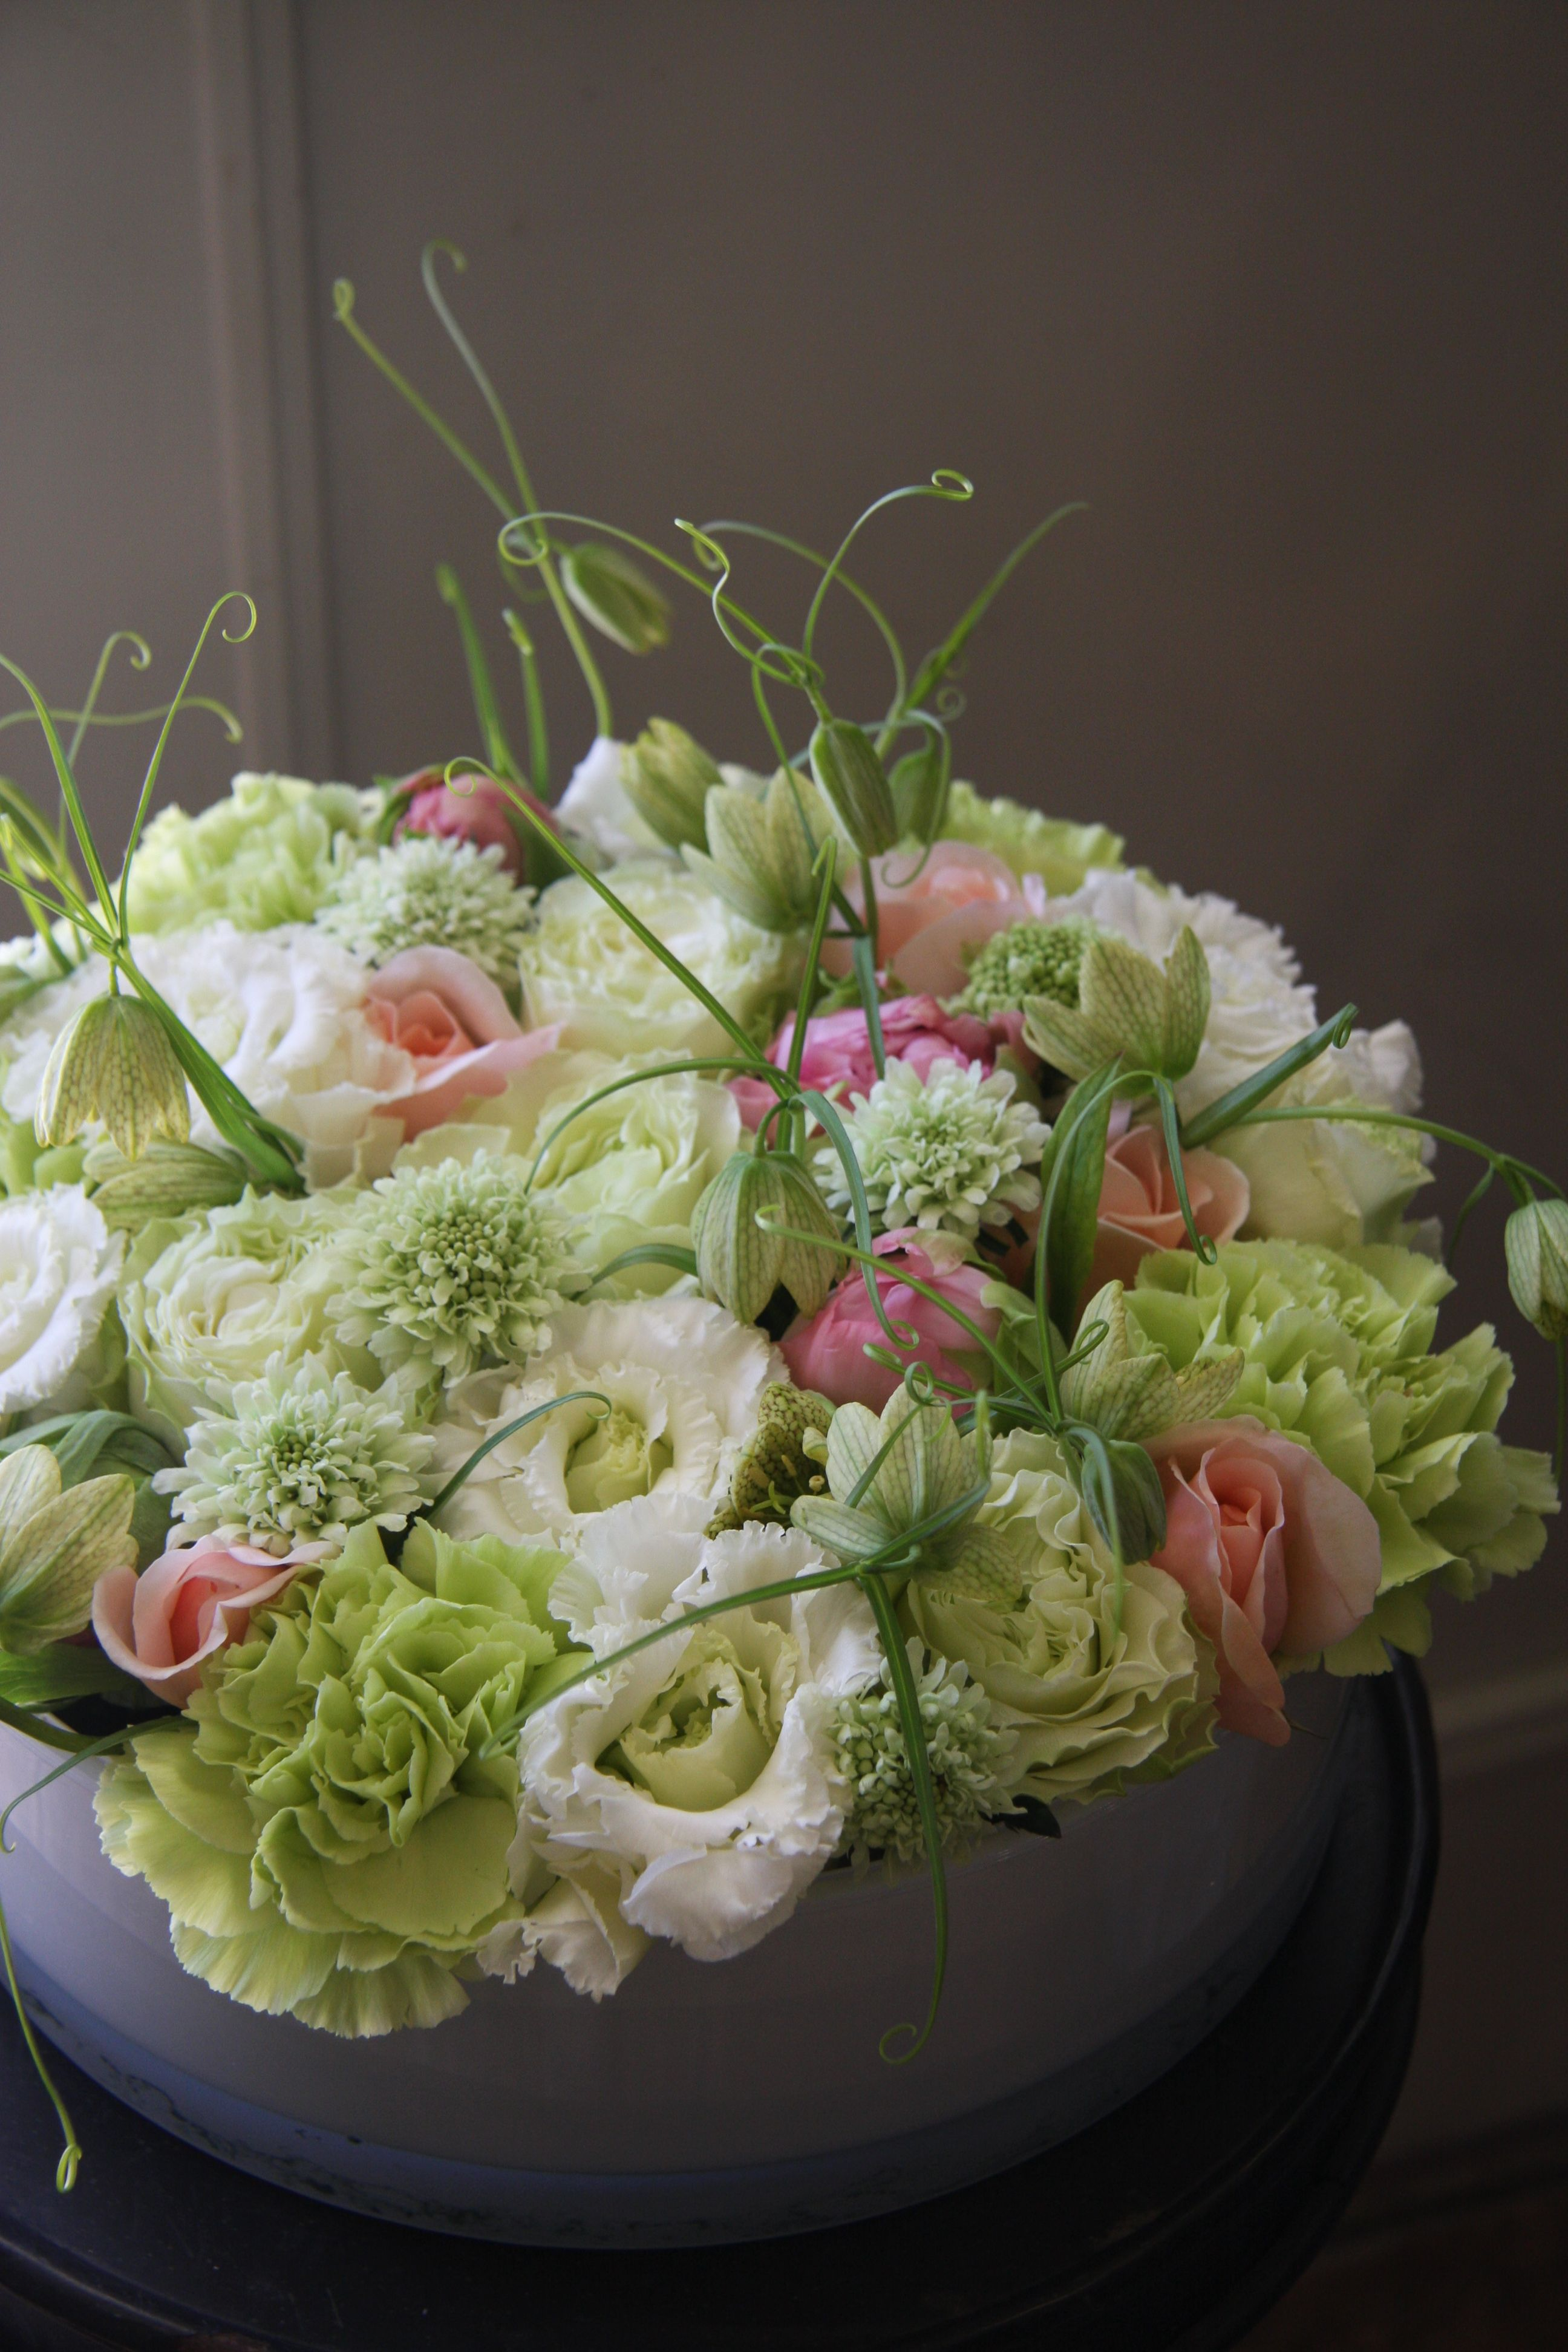 eustoma,rose,carnation and zcabiosa